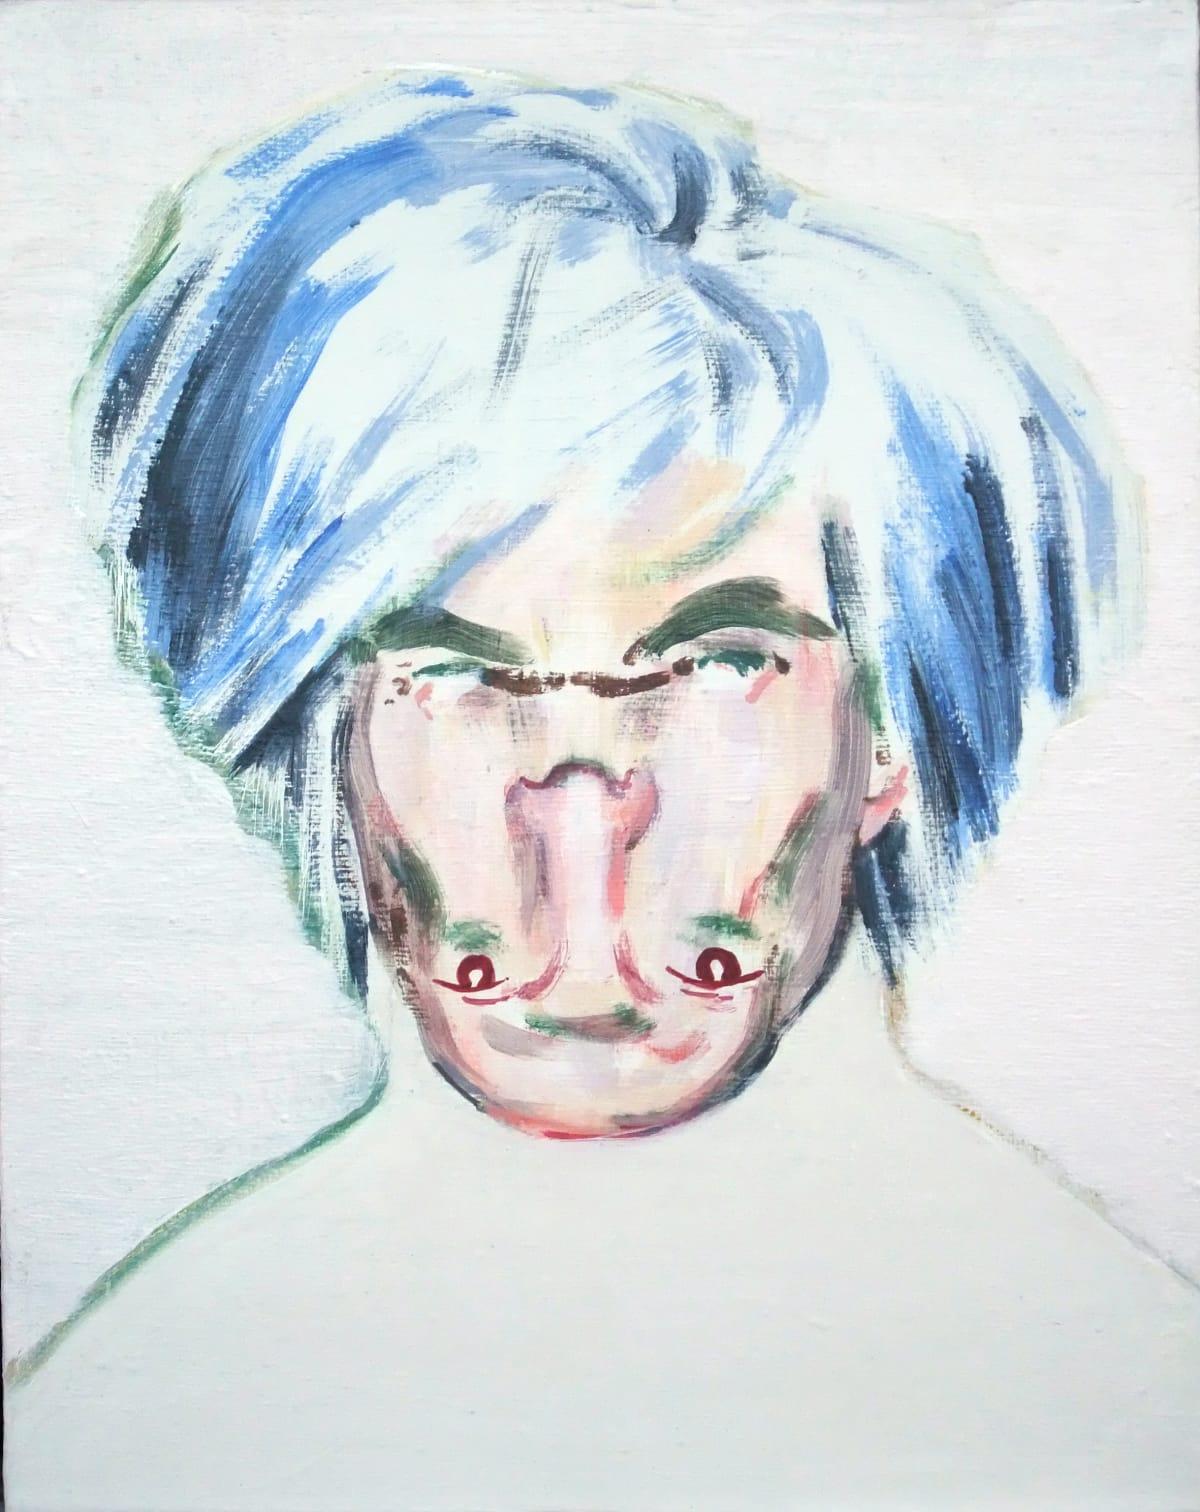 Darren Coffield Shockheaded Warhol I [Study], 2010 Acrylic on canvas 39 x 32 cm 15 3/8 x 12 5/8 in